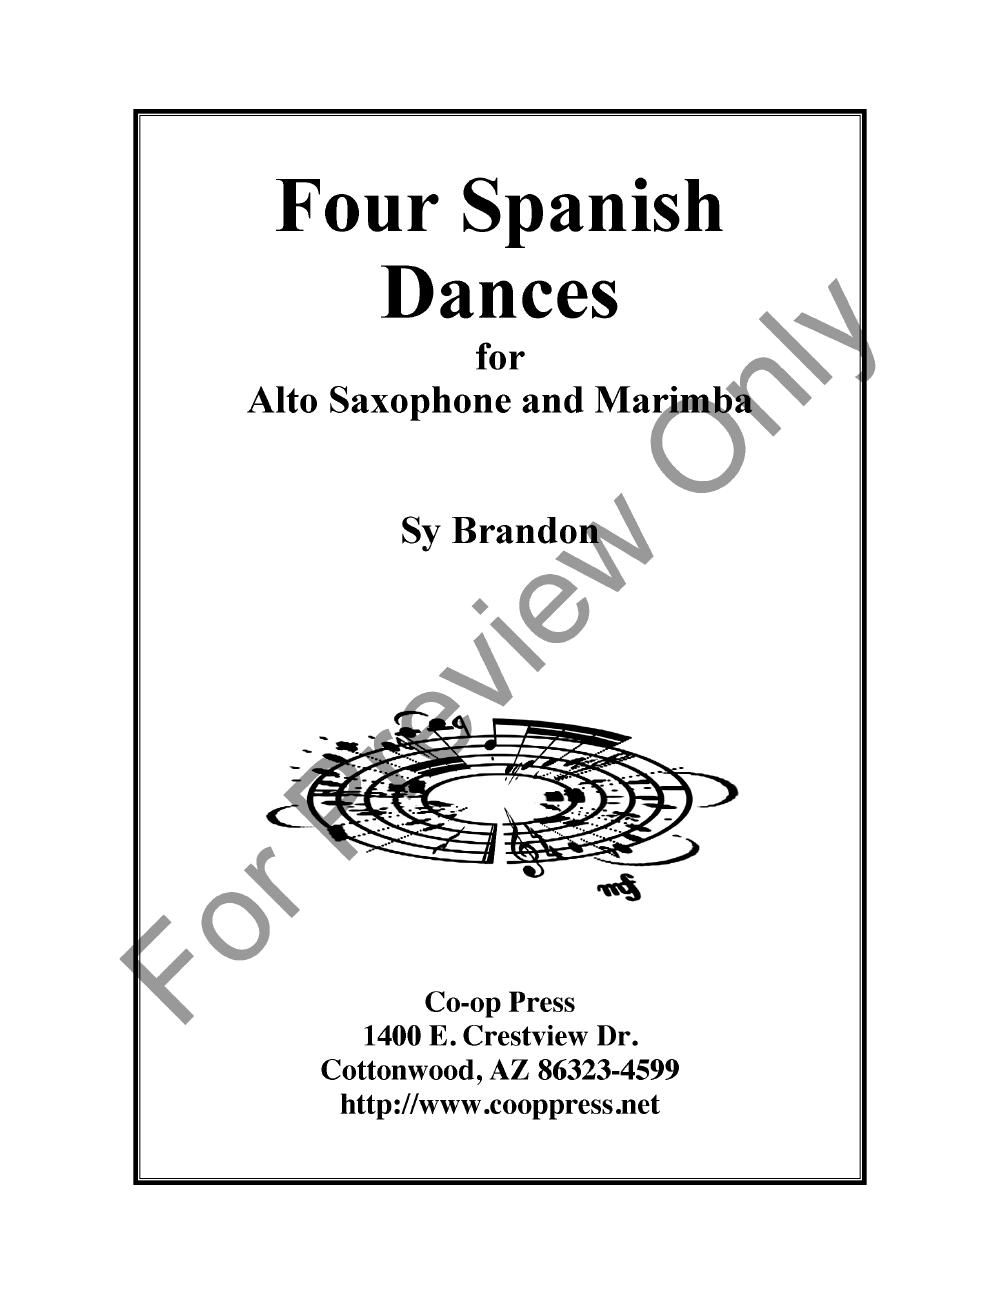 Four Spanish Dances Thumbnail